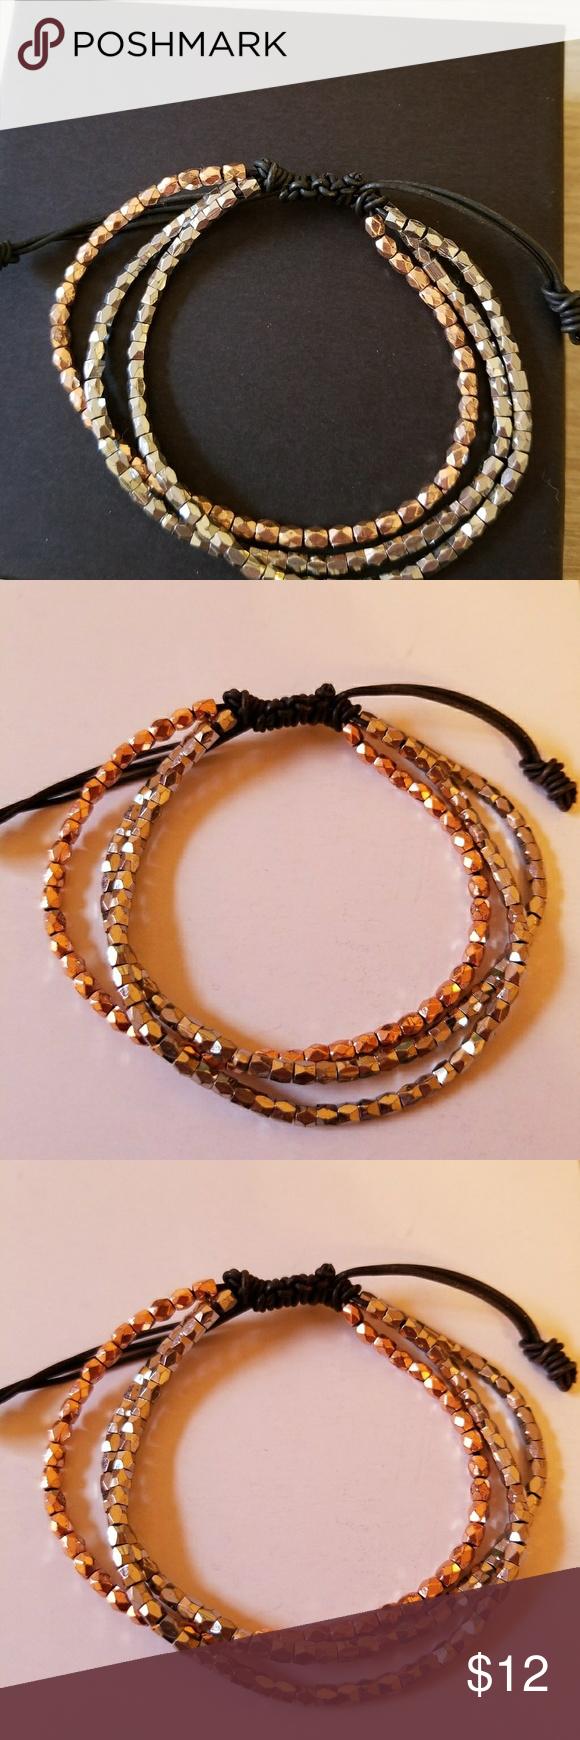 Express bracelet Rose gold and silver Black tie Silver bracelets